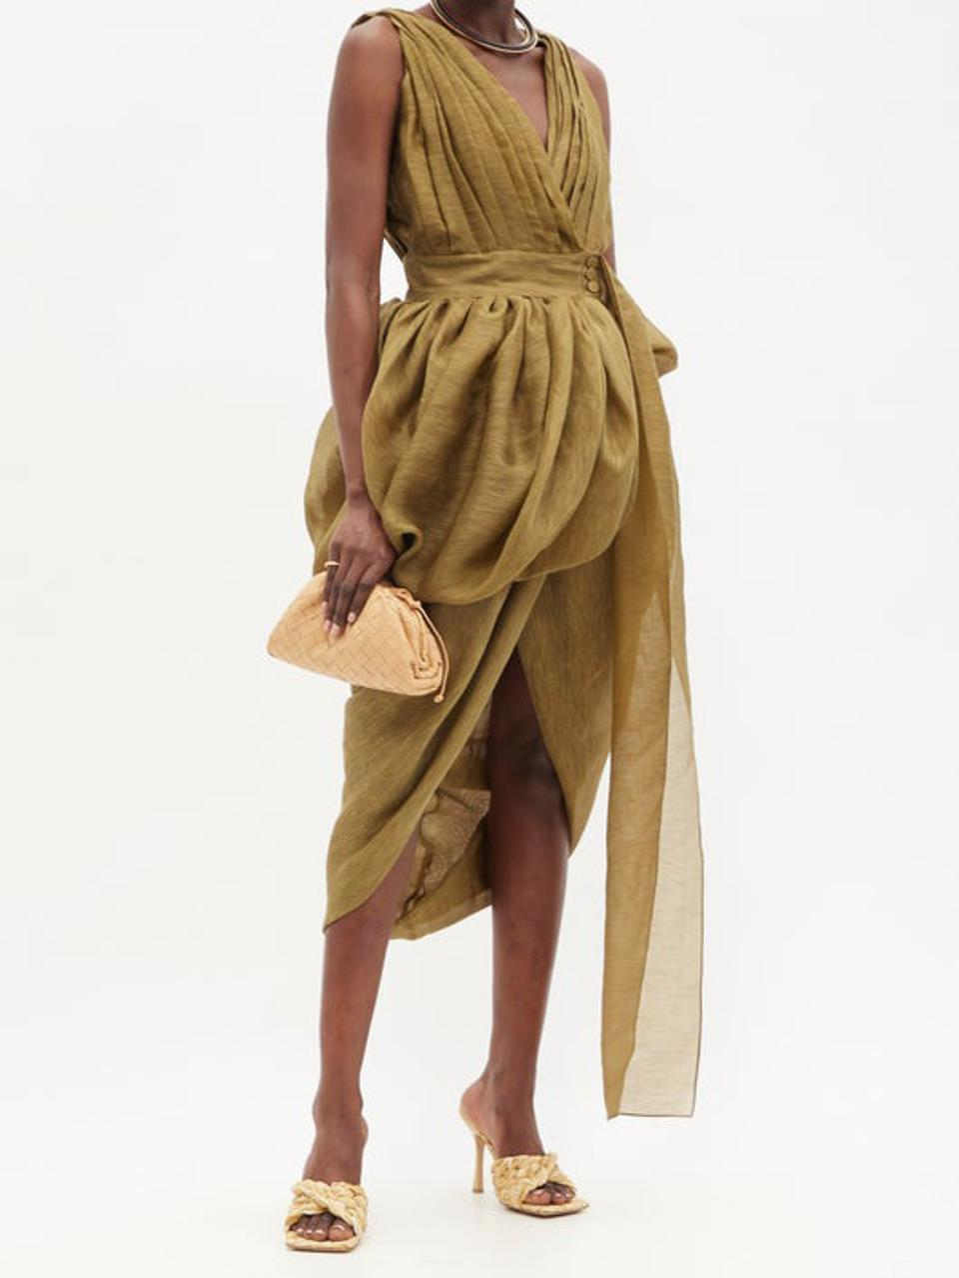 Draped Linen-Blend Voile Dress by Altuzarra: